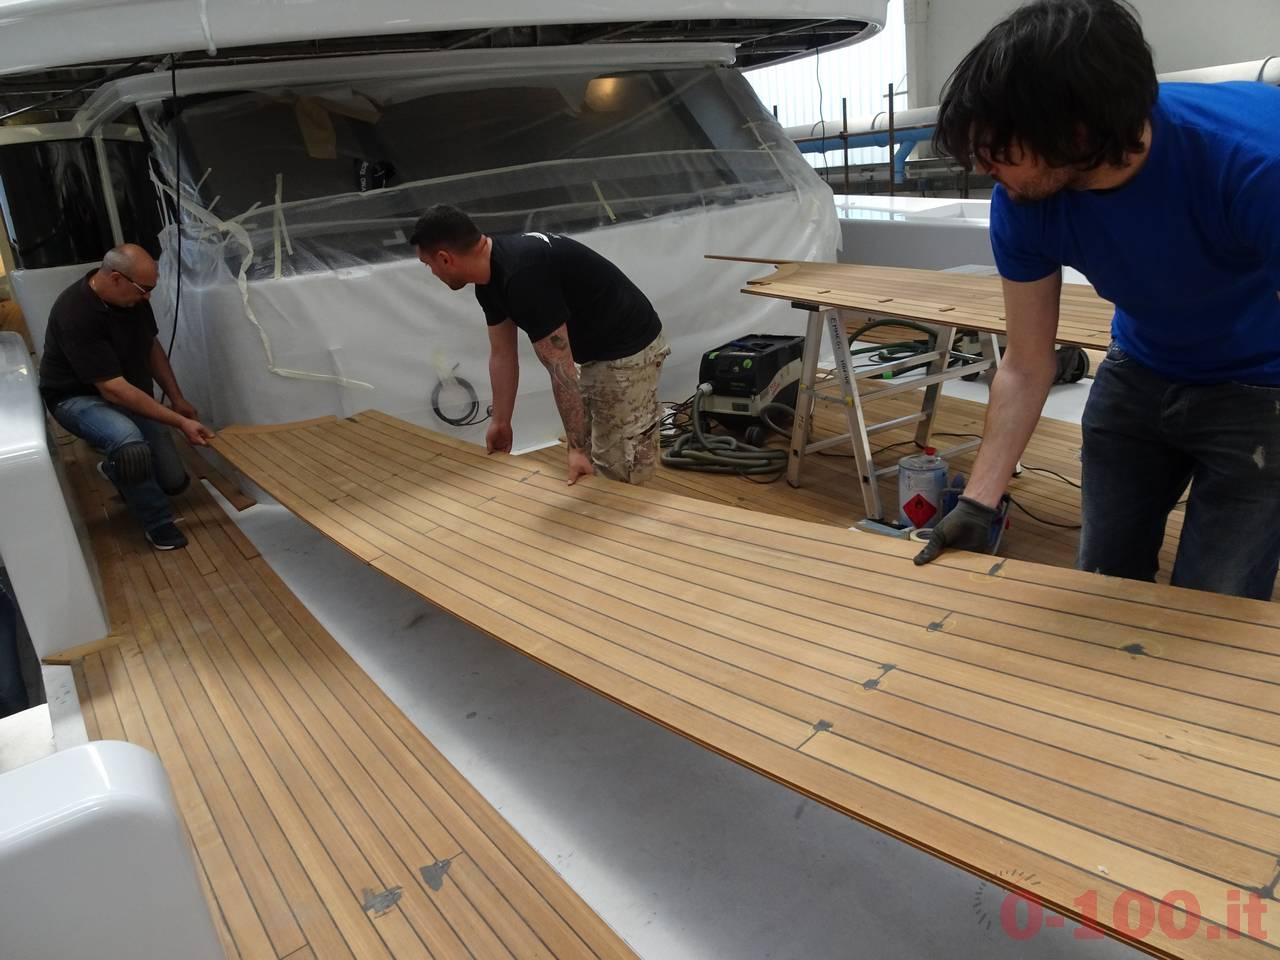 anteprima-mondiale-al-monaco-yacht-show-2016-otam-custom-range-sd35-35mt-my-gipsy-prezzo-price_0-1009